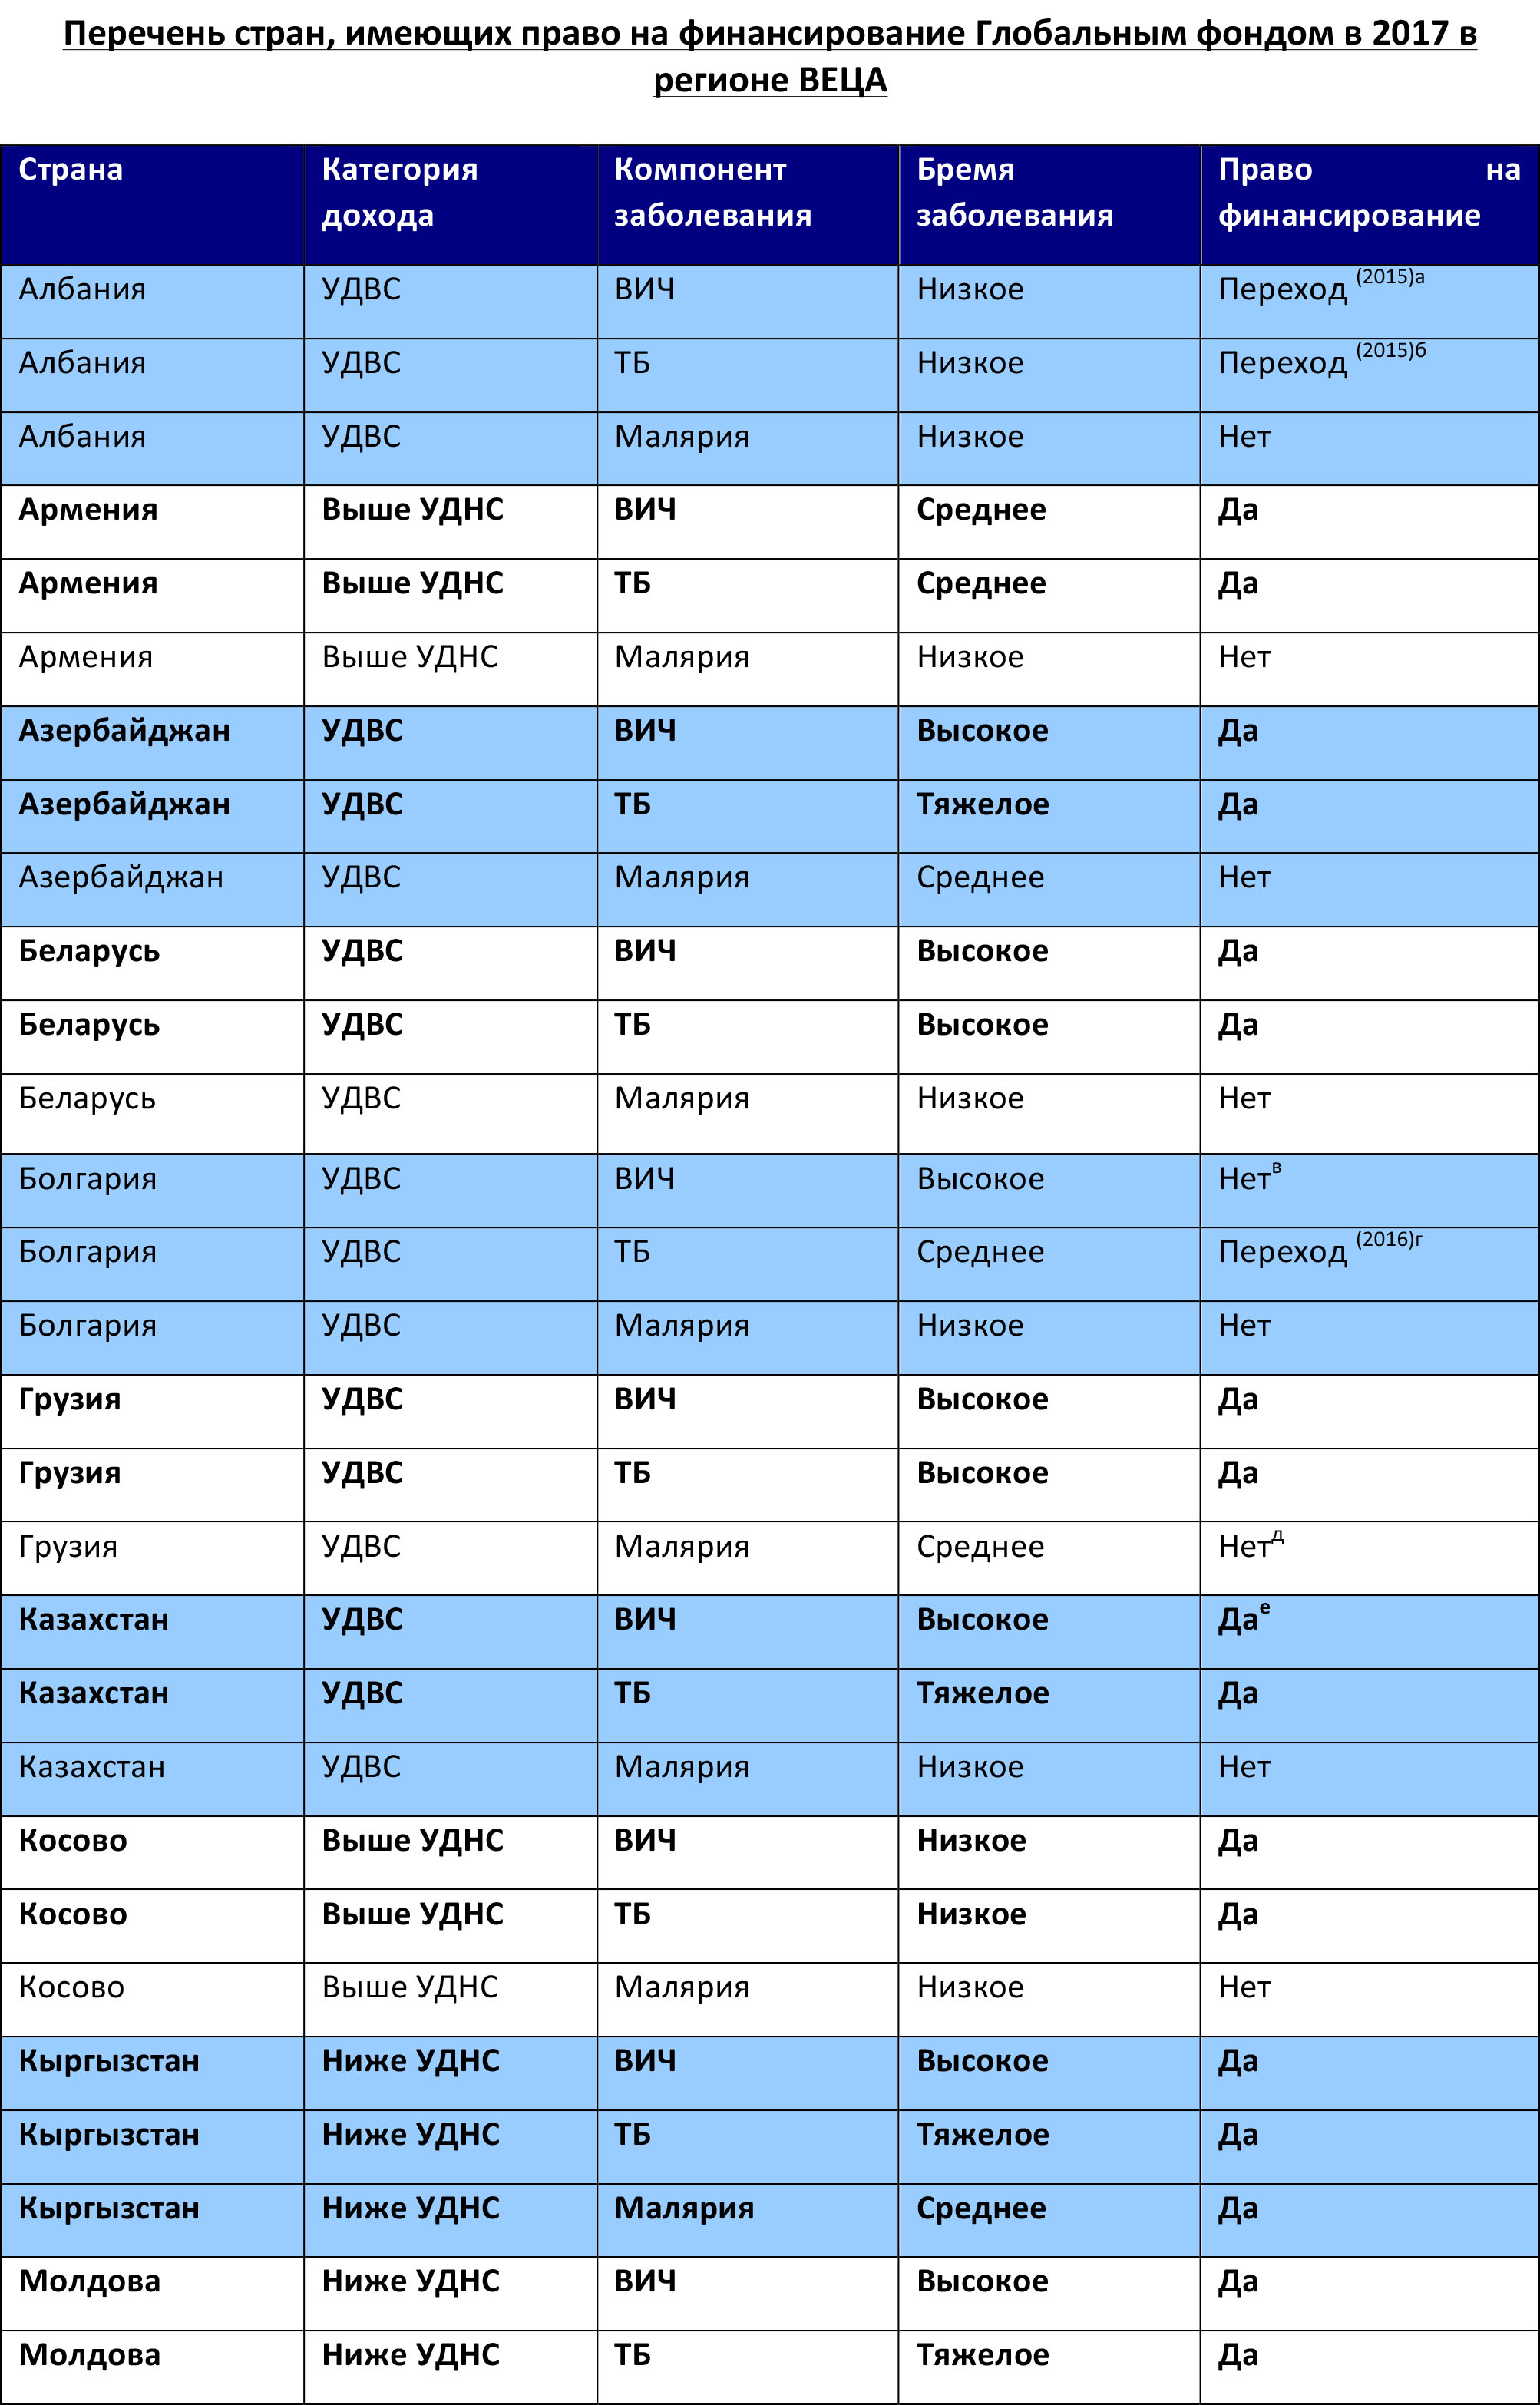 Microsoft Word - Перечень стран.docx